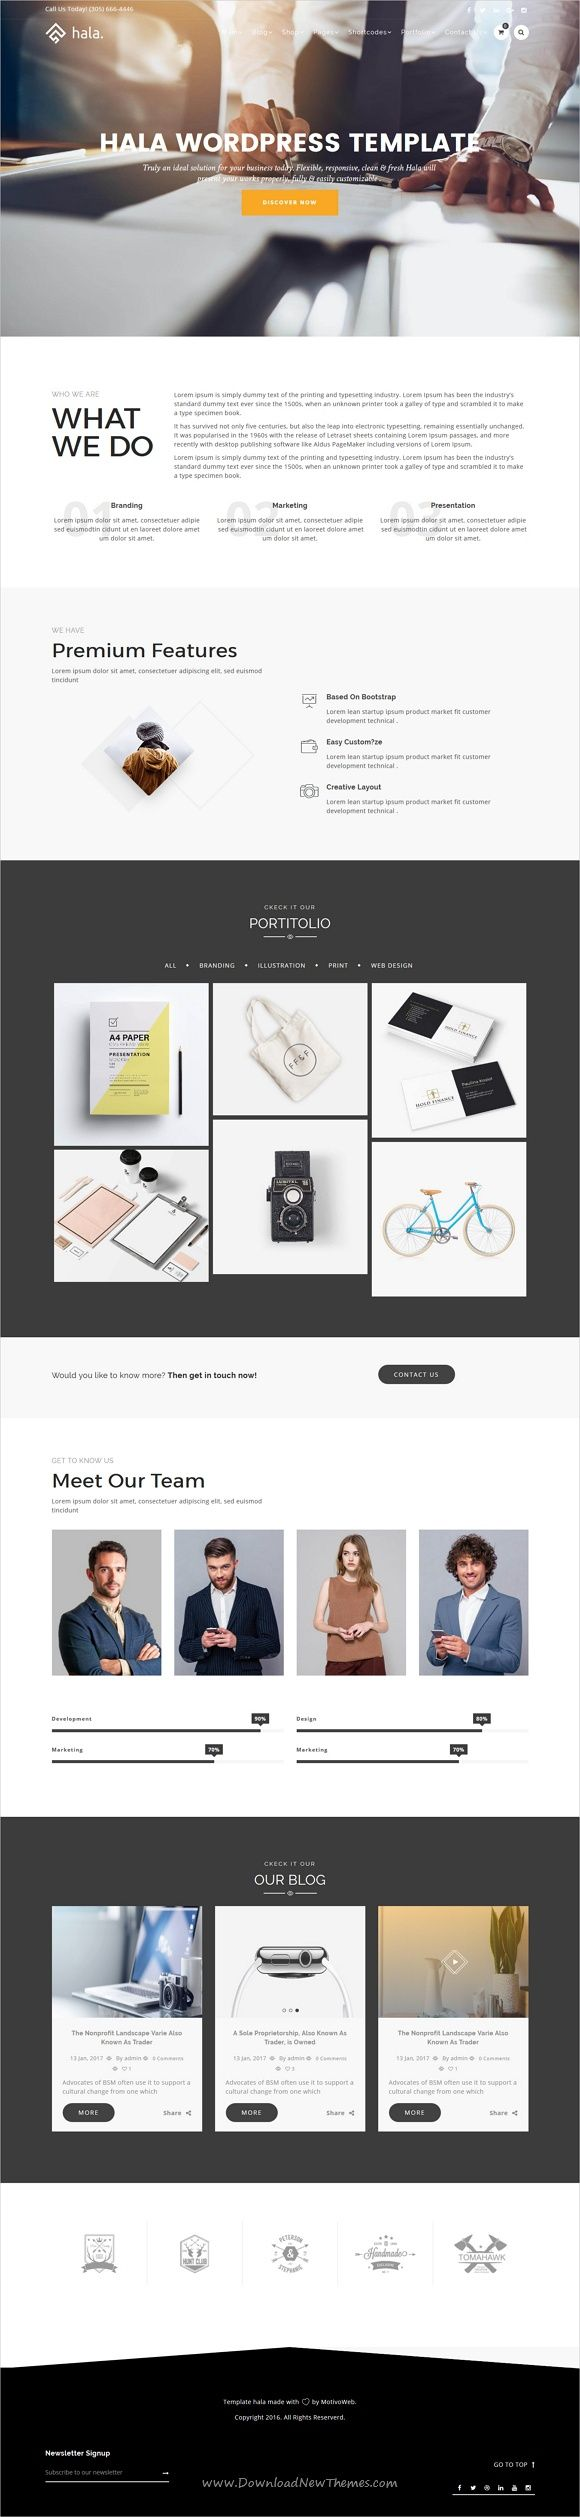 Hala Is A Creative Responsive Wordpress Theme For Showcase Your Portfolio Agency Photography Or Creative Wordpress Themes Wordpress Theme Layout Download